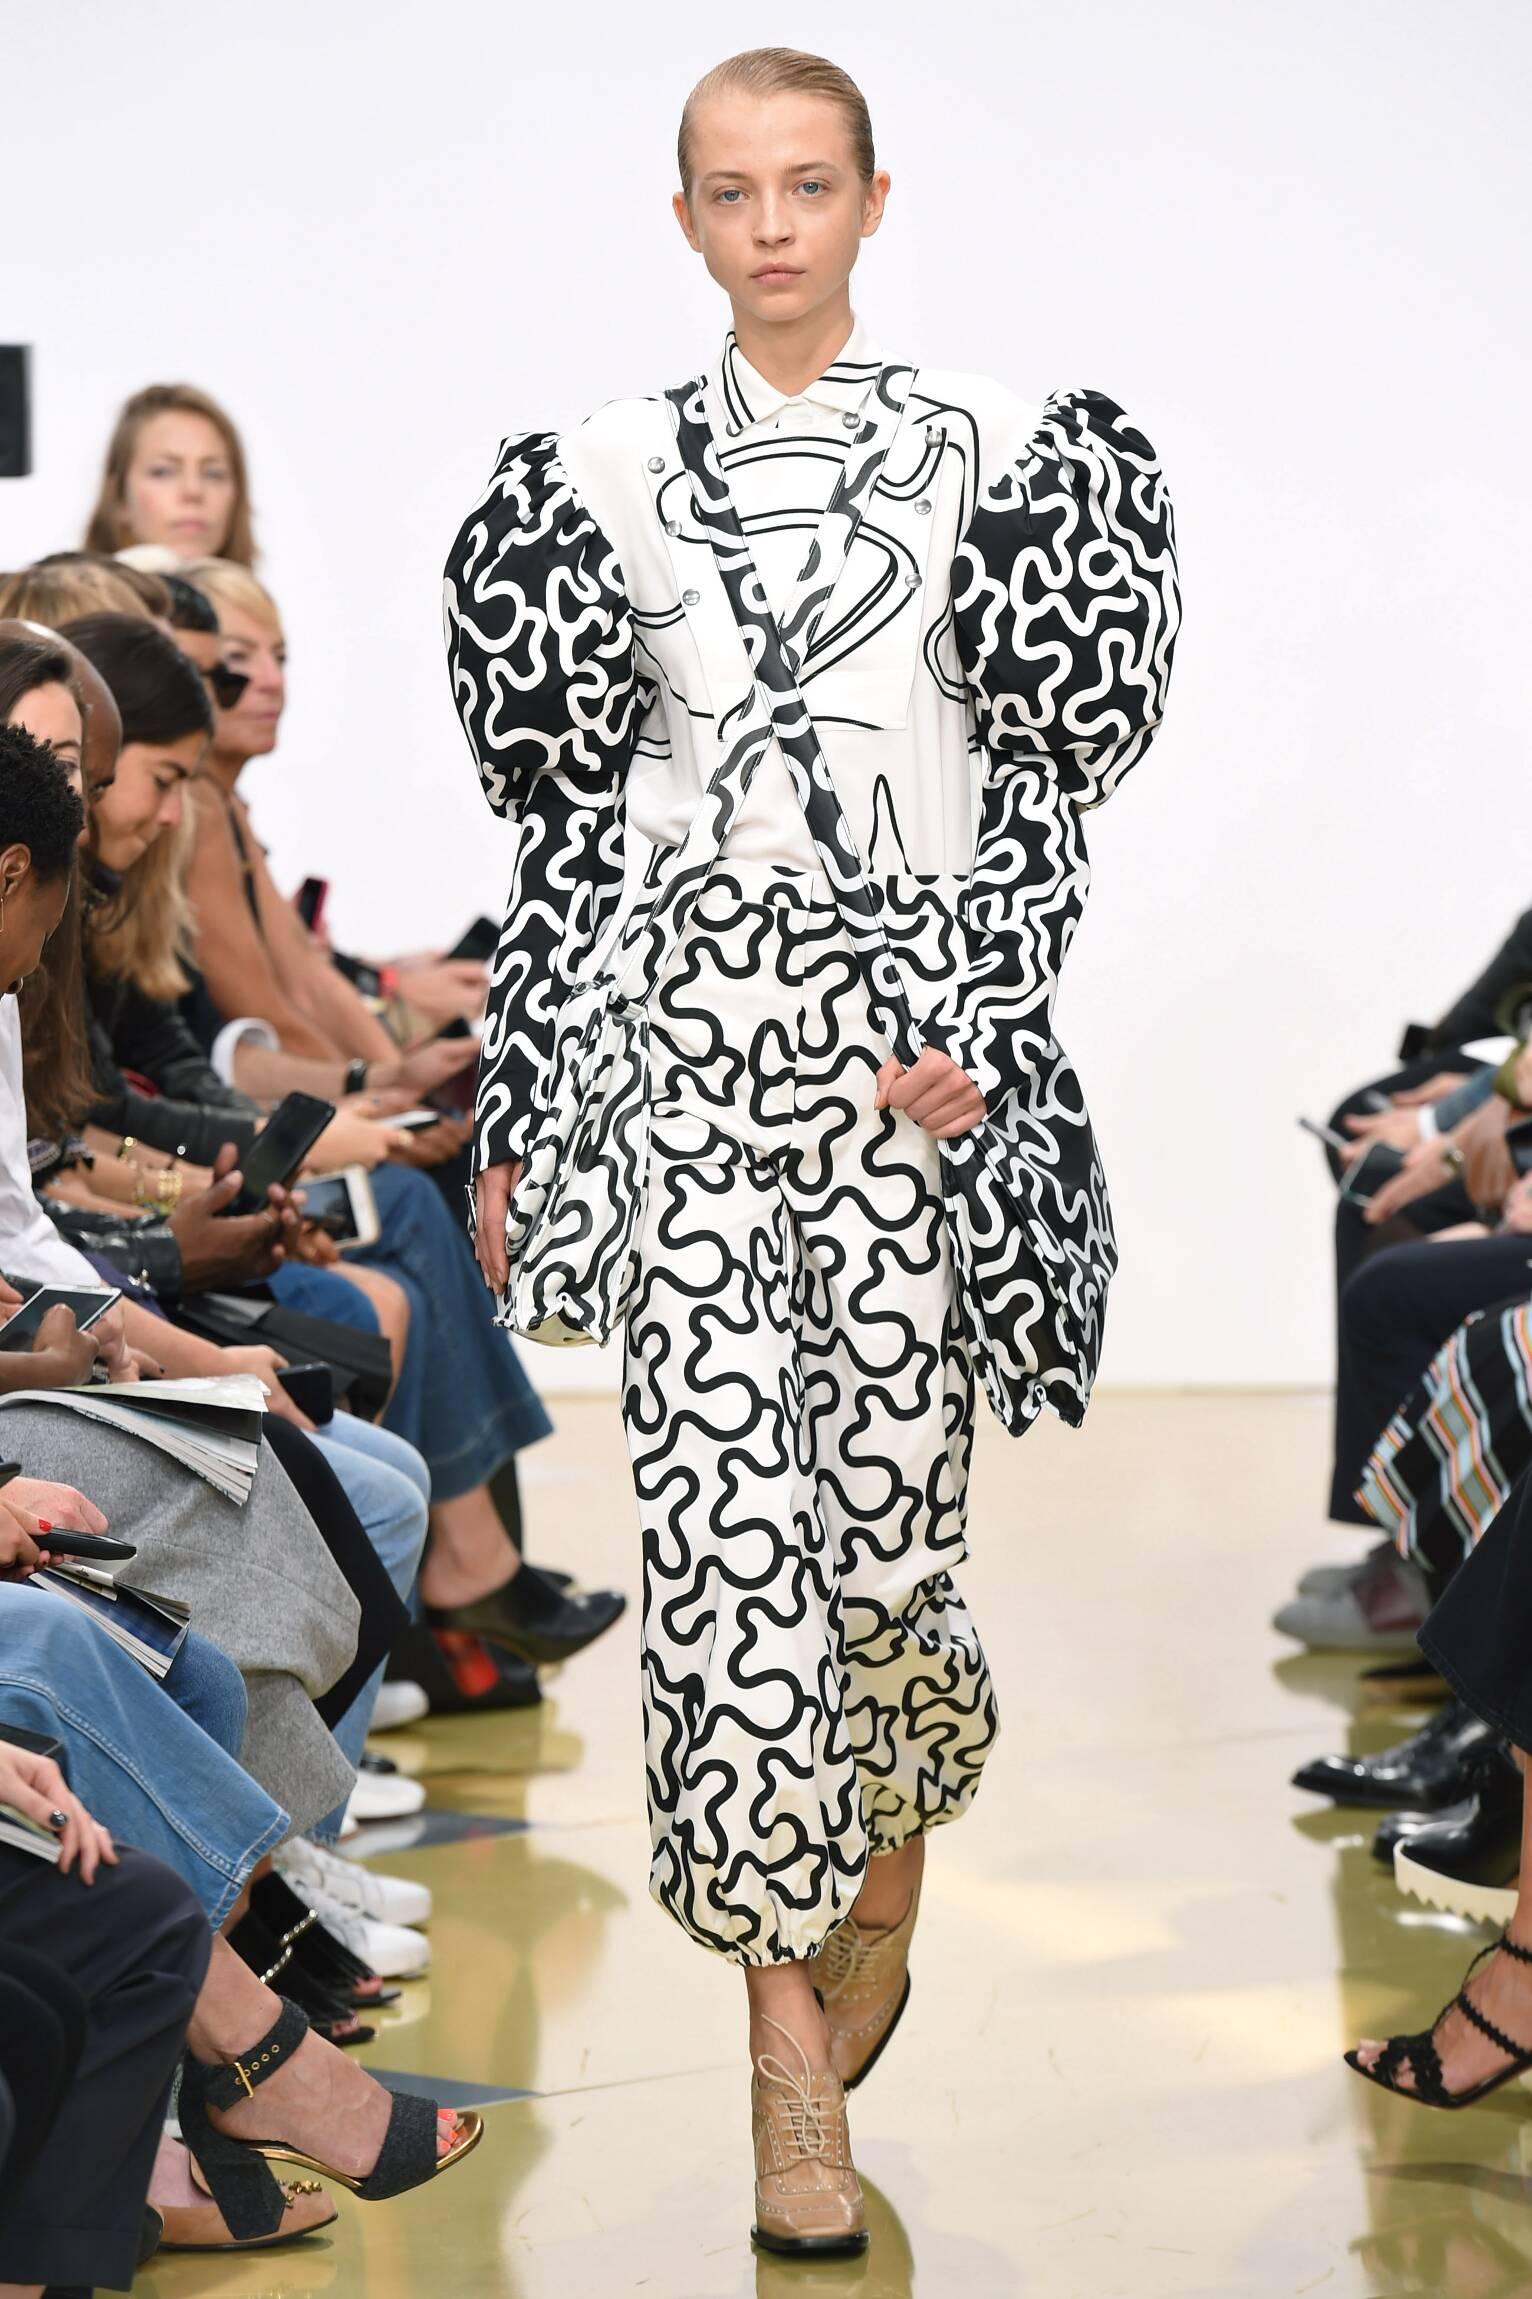 Catwalk J.W. Anderson Spring Summer 2016 Women's Collection London Fashion Week